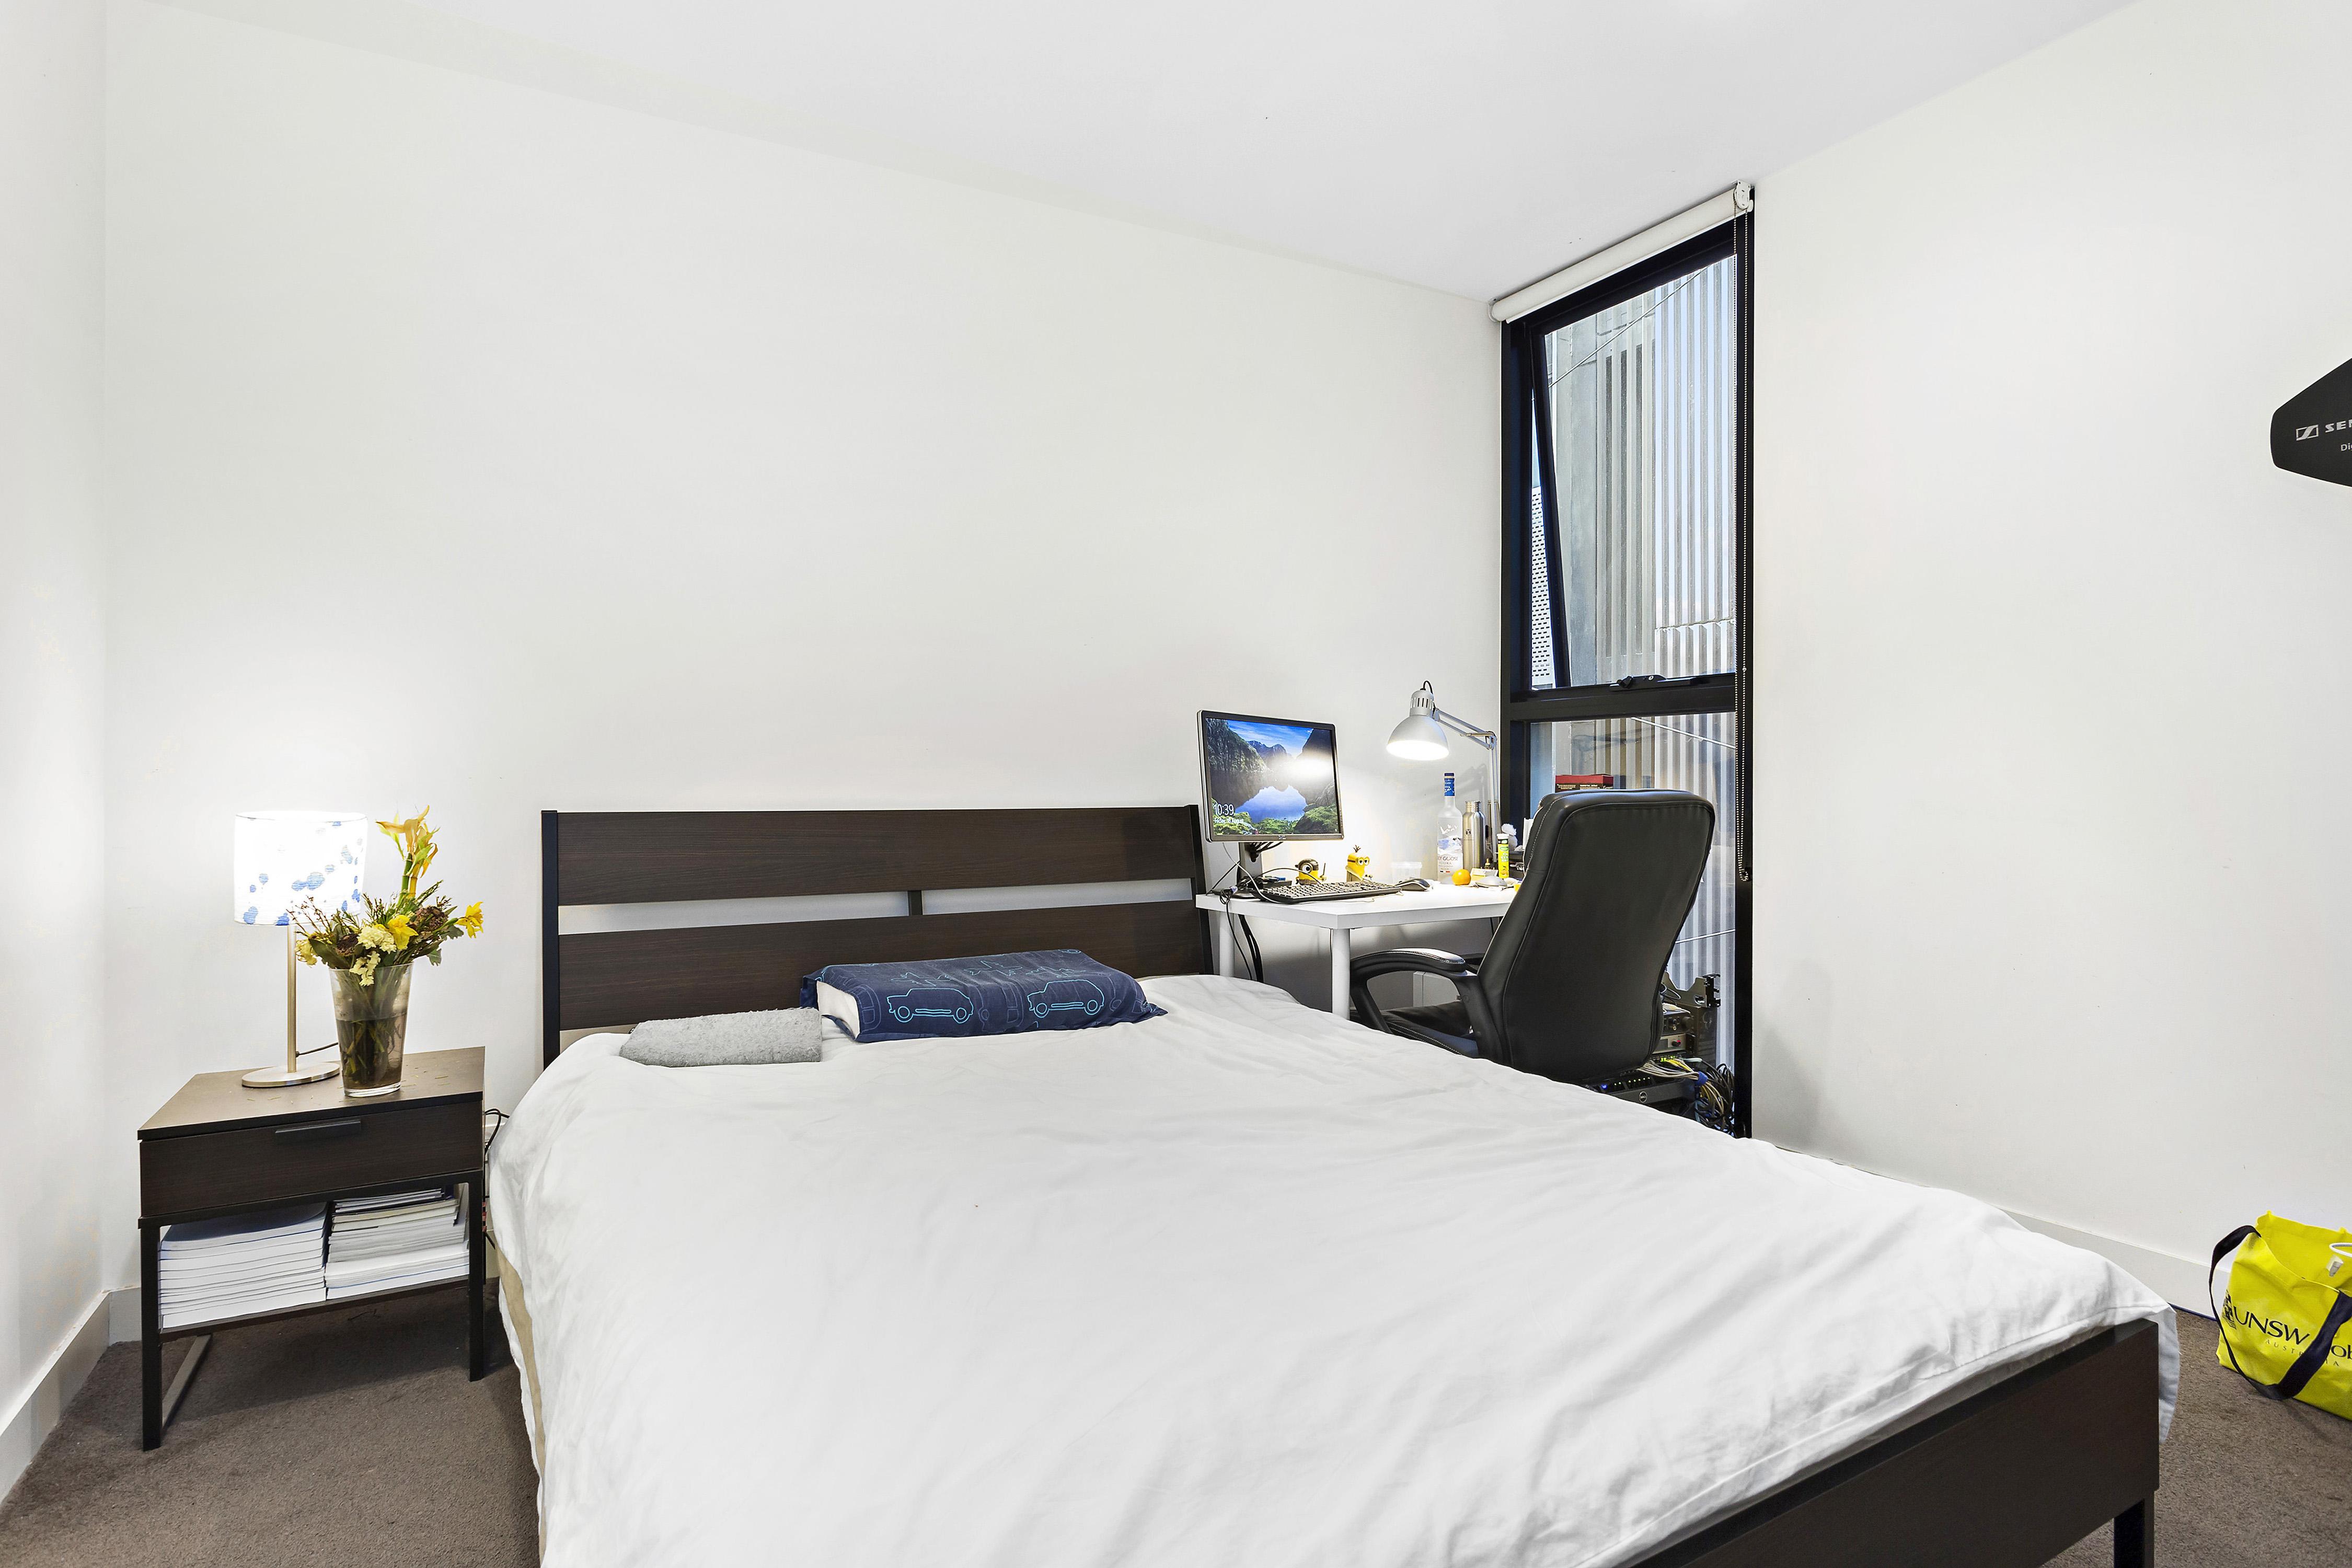 108-97-flemington-road-north-melbourne-student-accommodation-Melbourne-Bedroom-2-Unilodgers